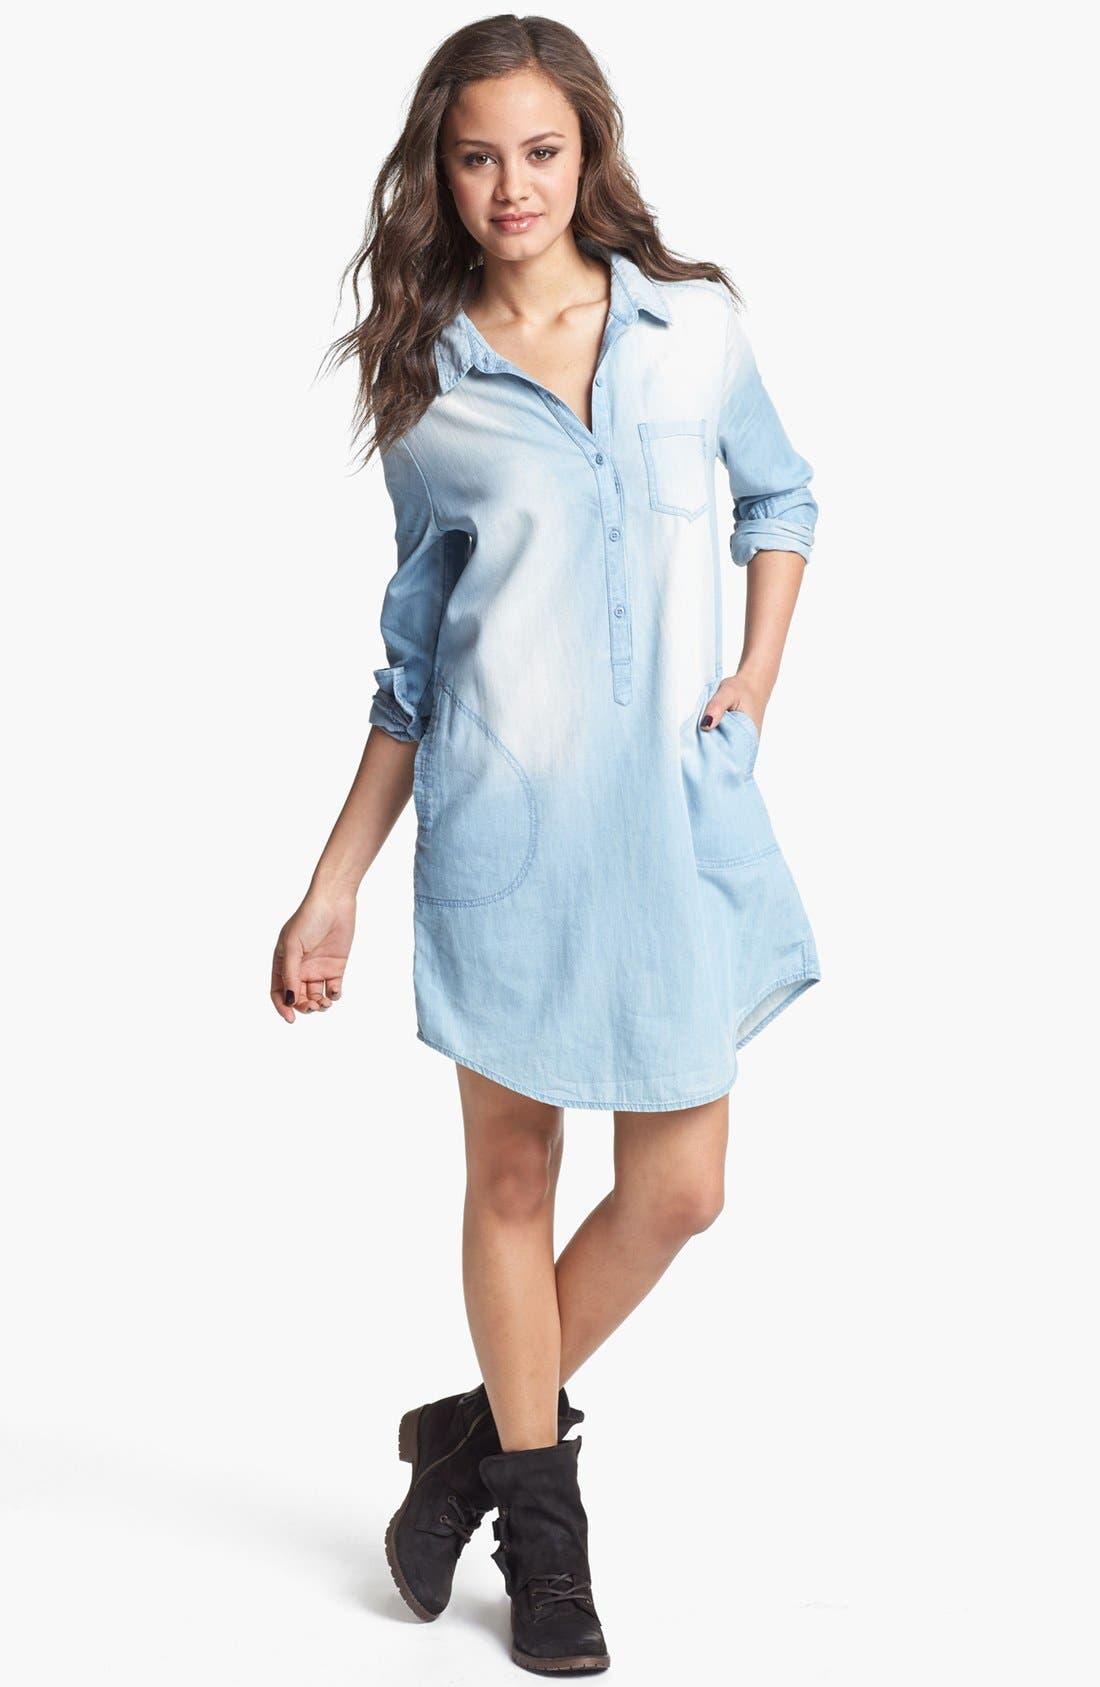 Alternate Image 1 Selected - Rubbish® Chambray Shirtdress (Juniors)